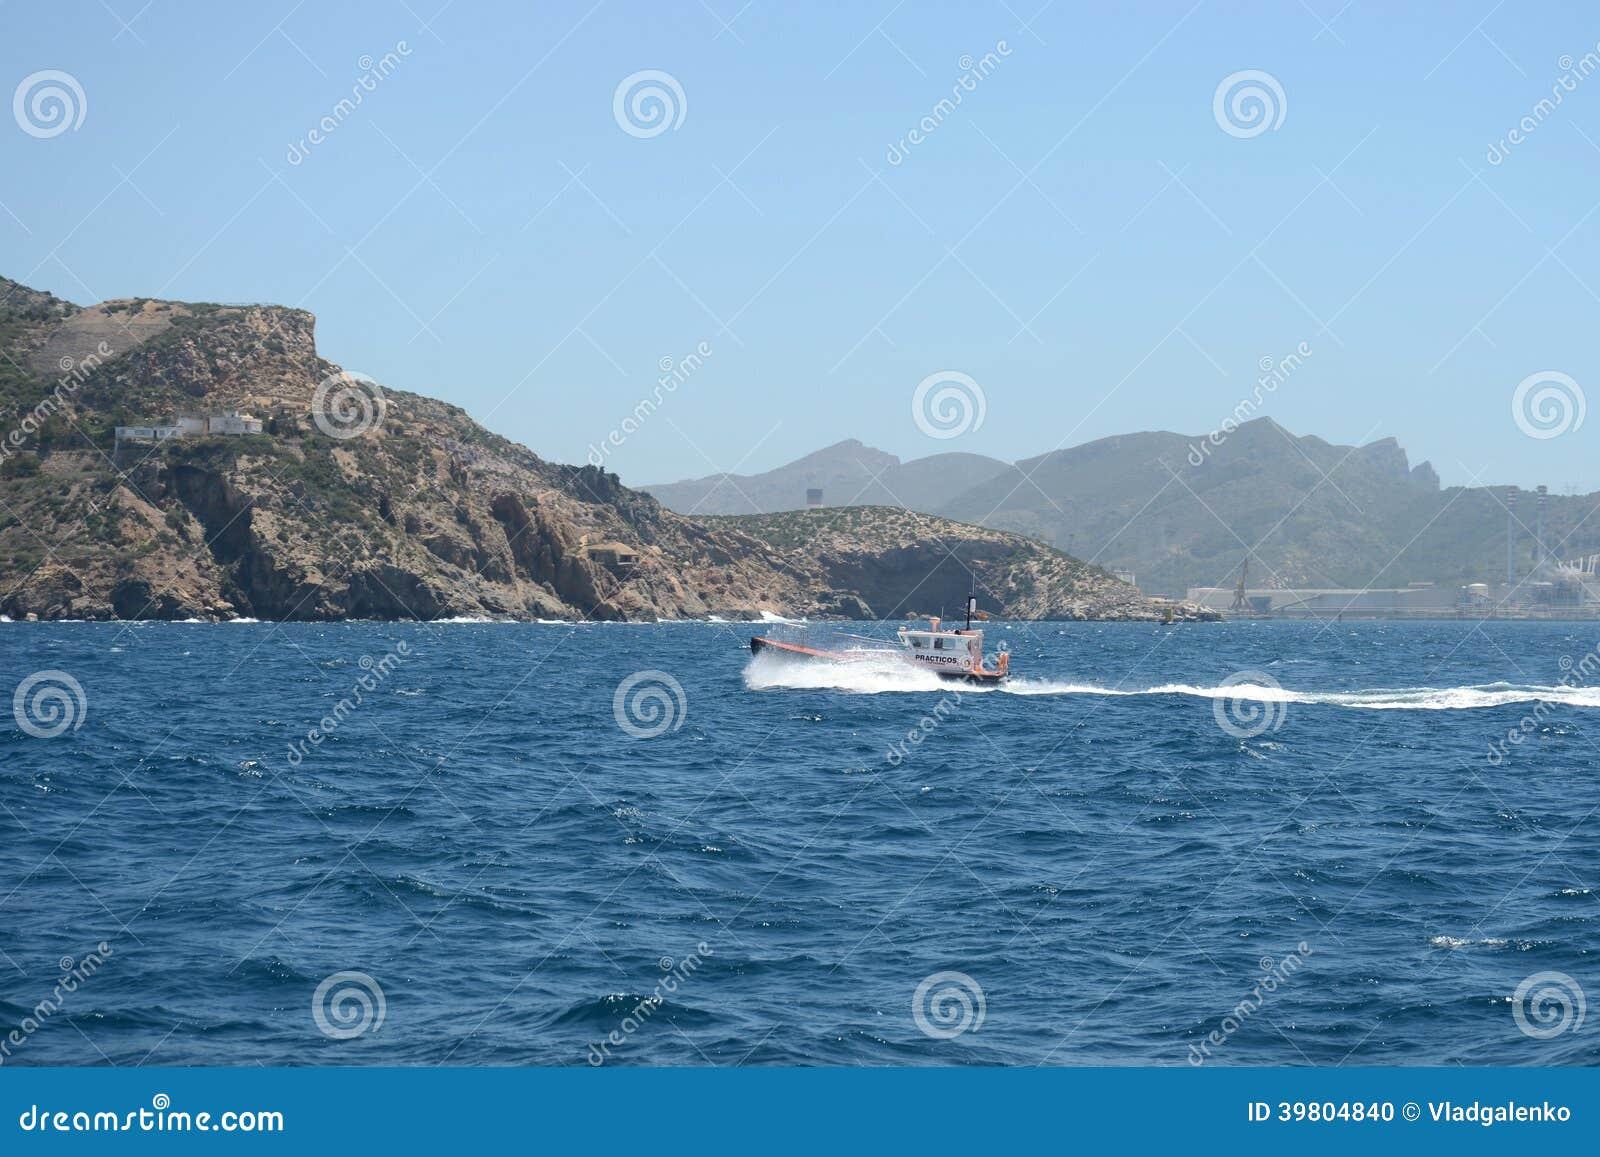 the port of cartagena spain stock photo image of base mursia